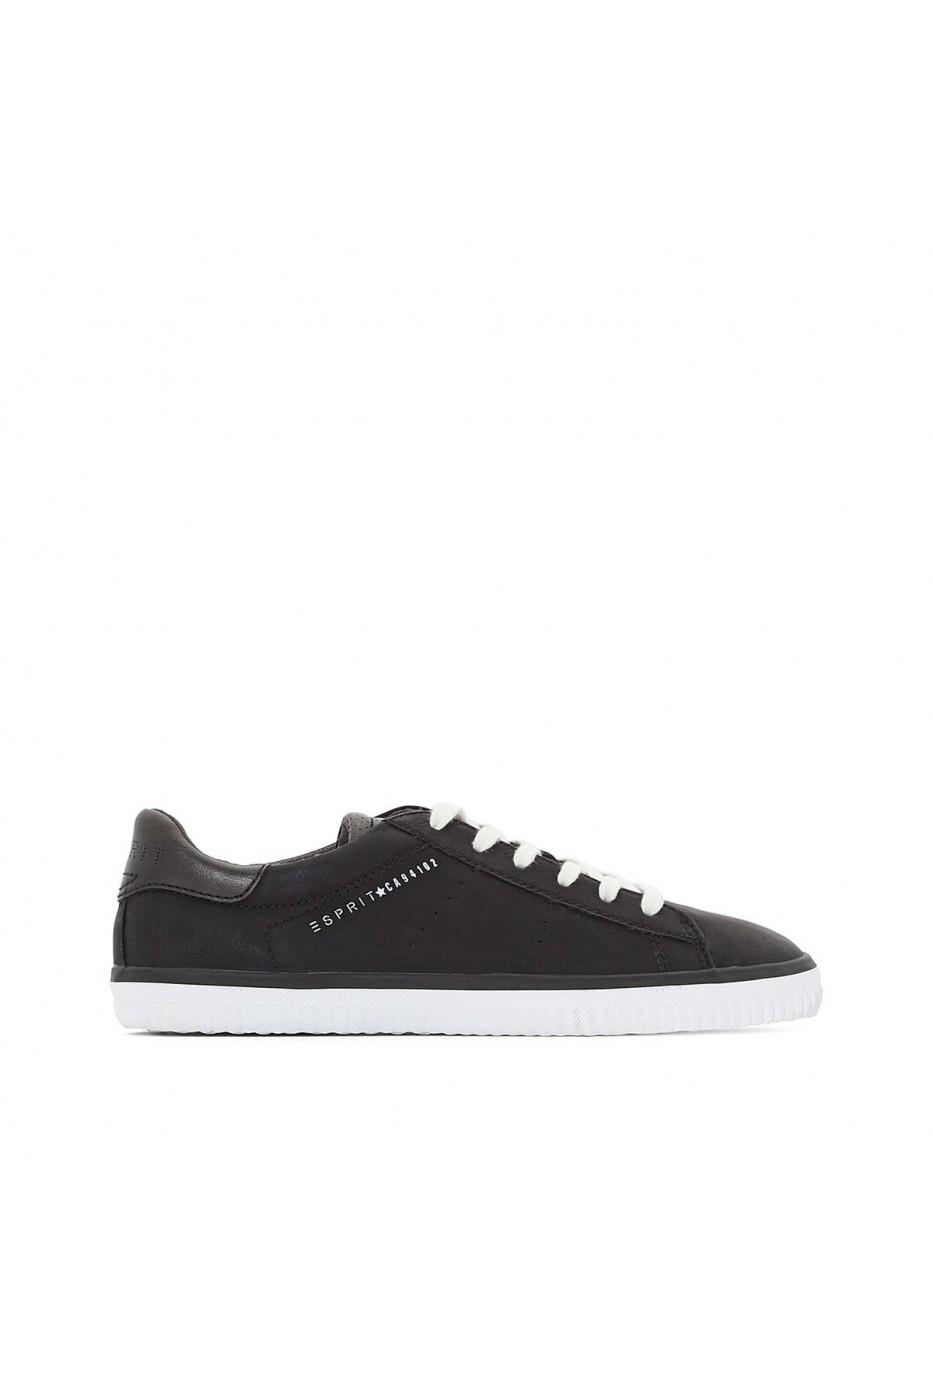 ESPRIT Sneaker cipő LRD-GEN079 negru els Fekete - FashionUP! f58a31963f